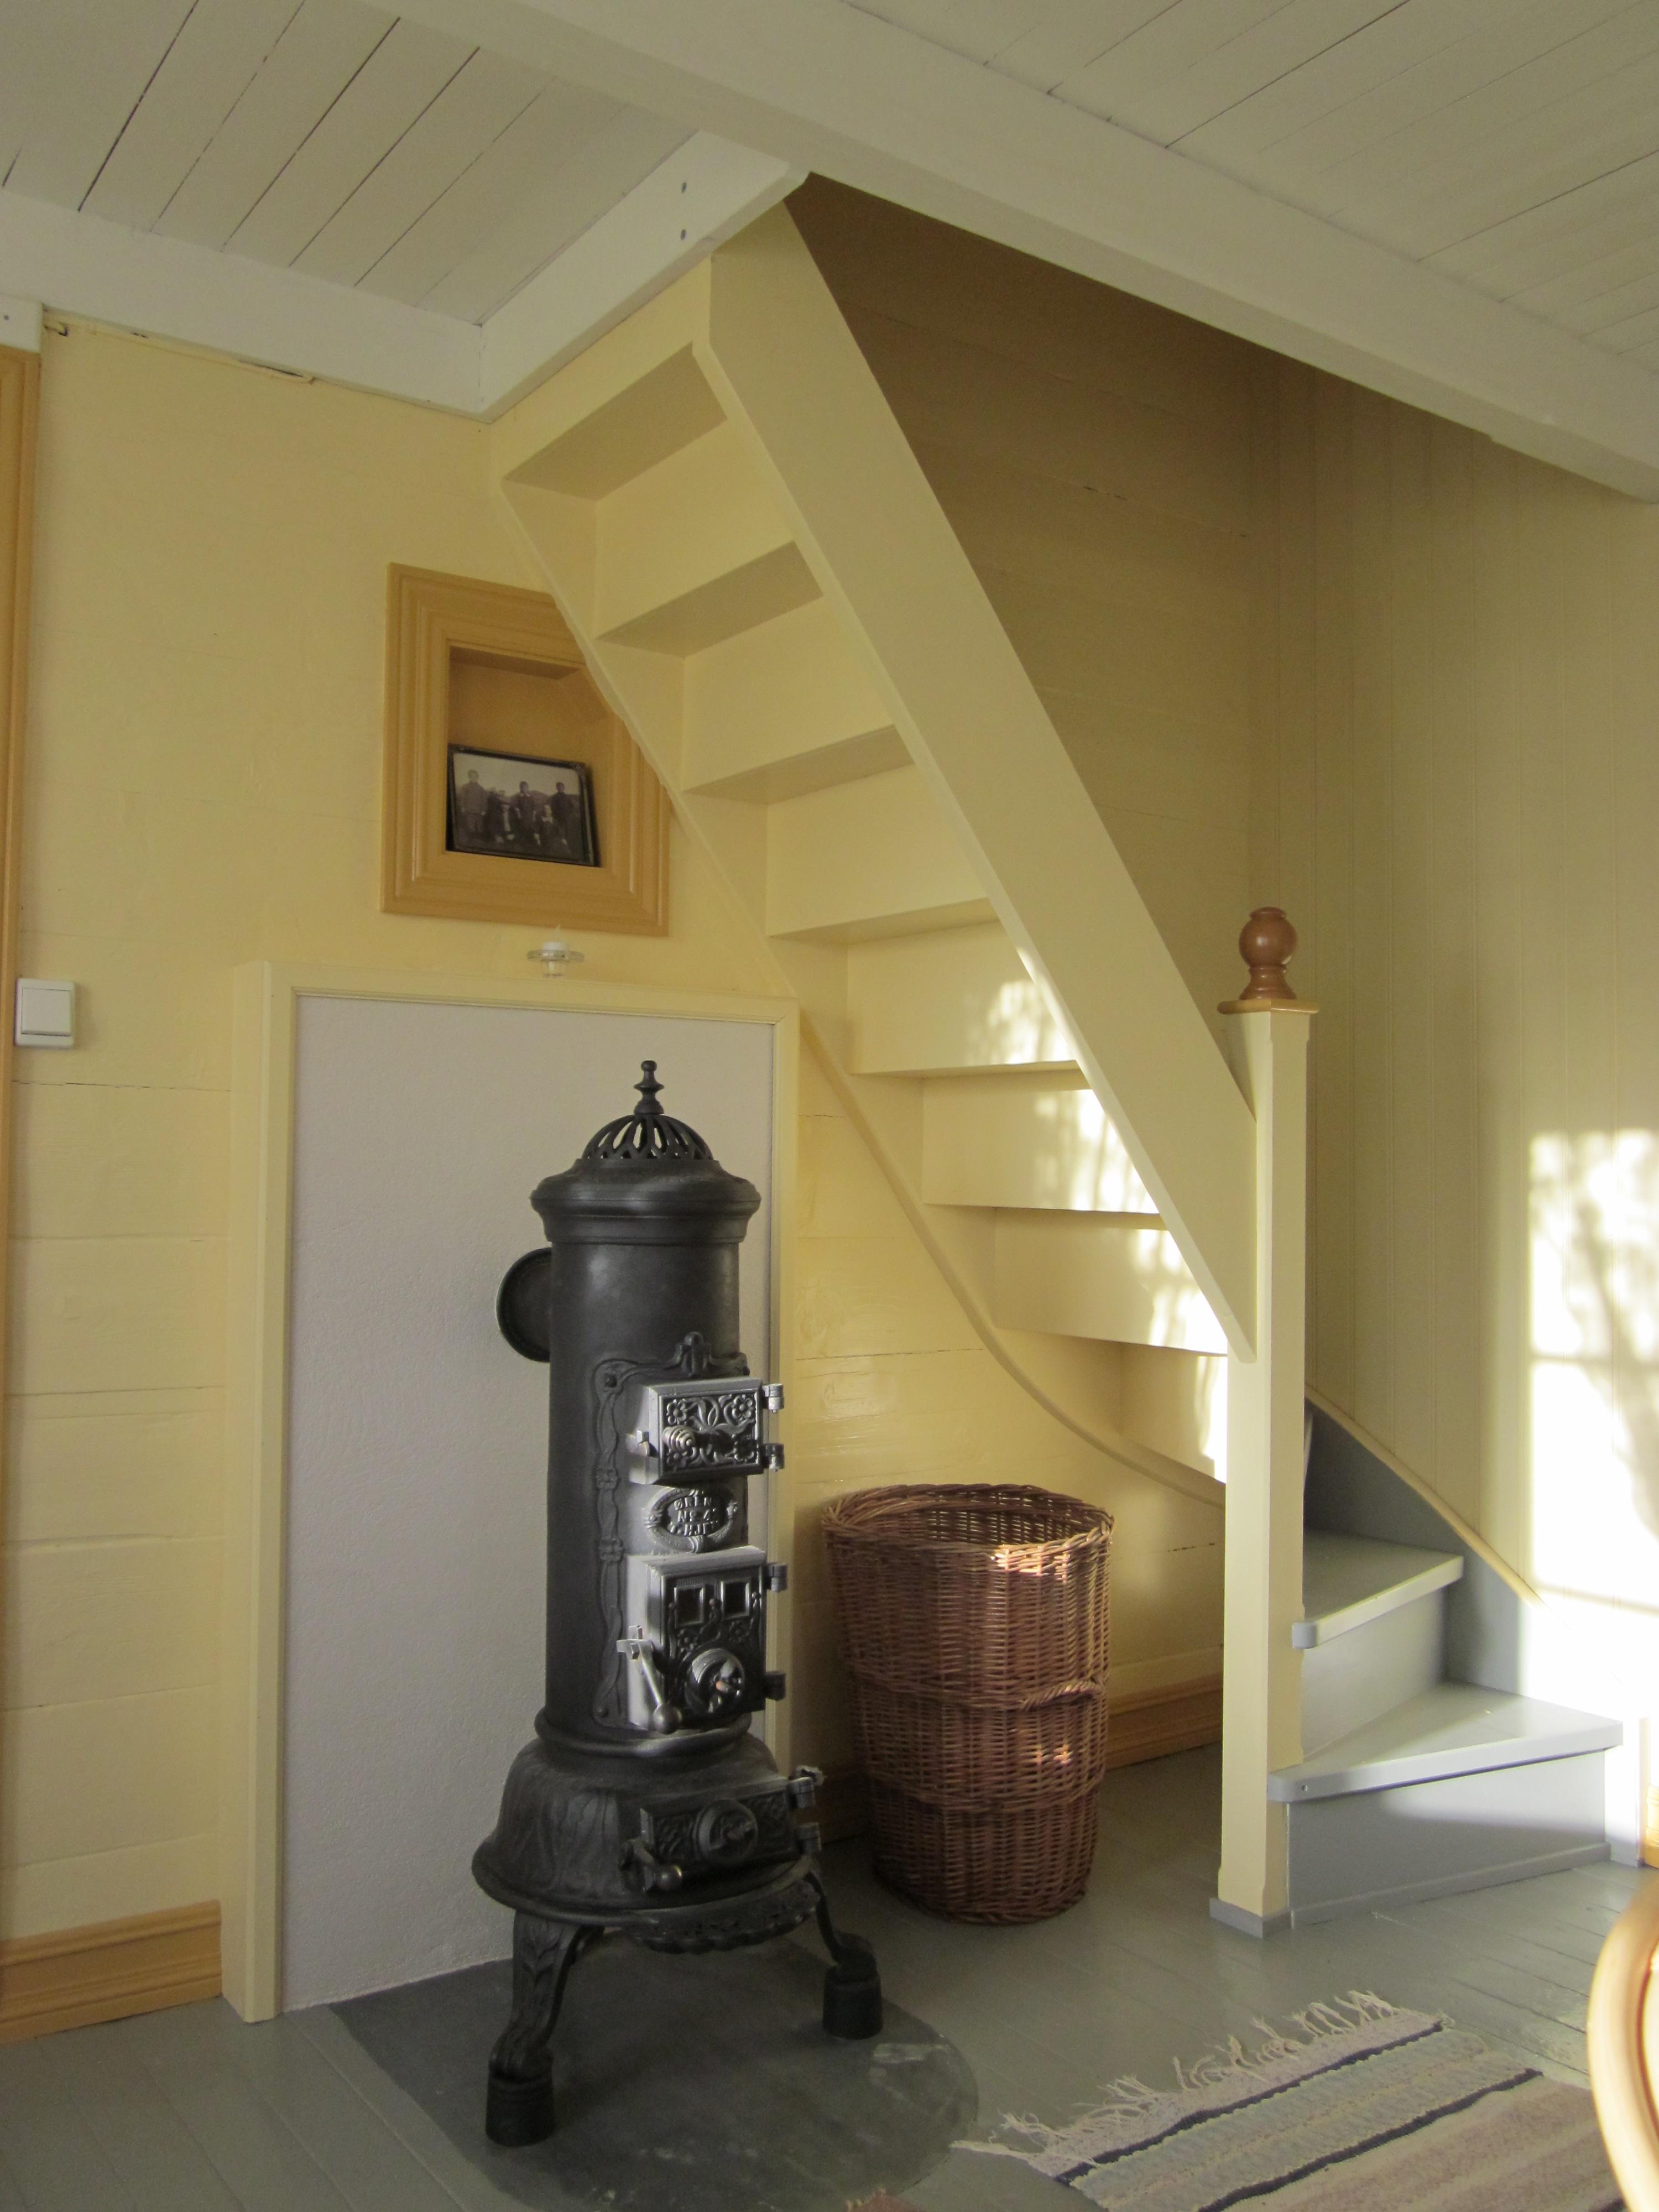 INorway Holiday Home, accomodation, whalesafari, Lofoten, AndoyVesterålen, North Norway, det røde hus